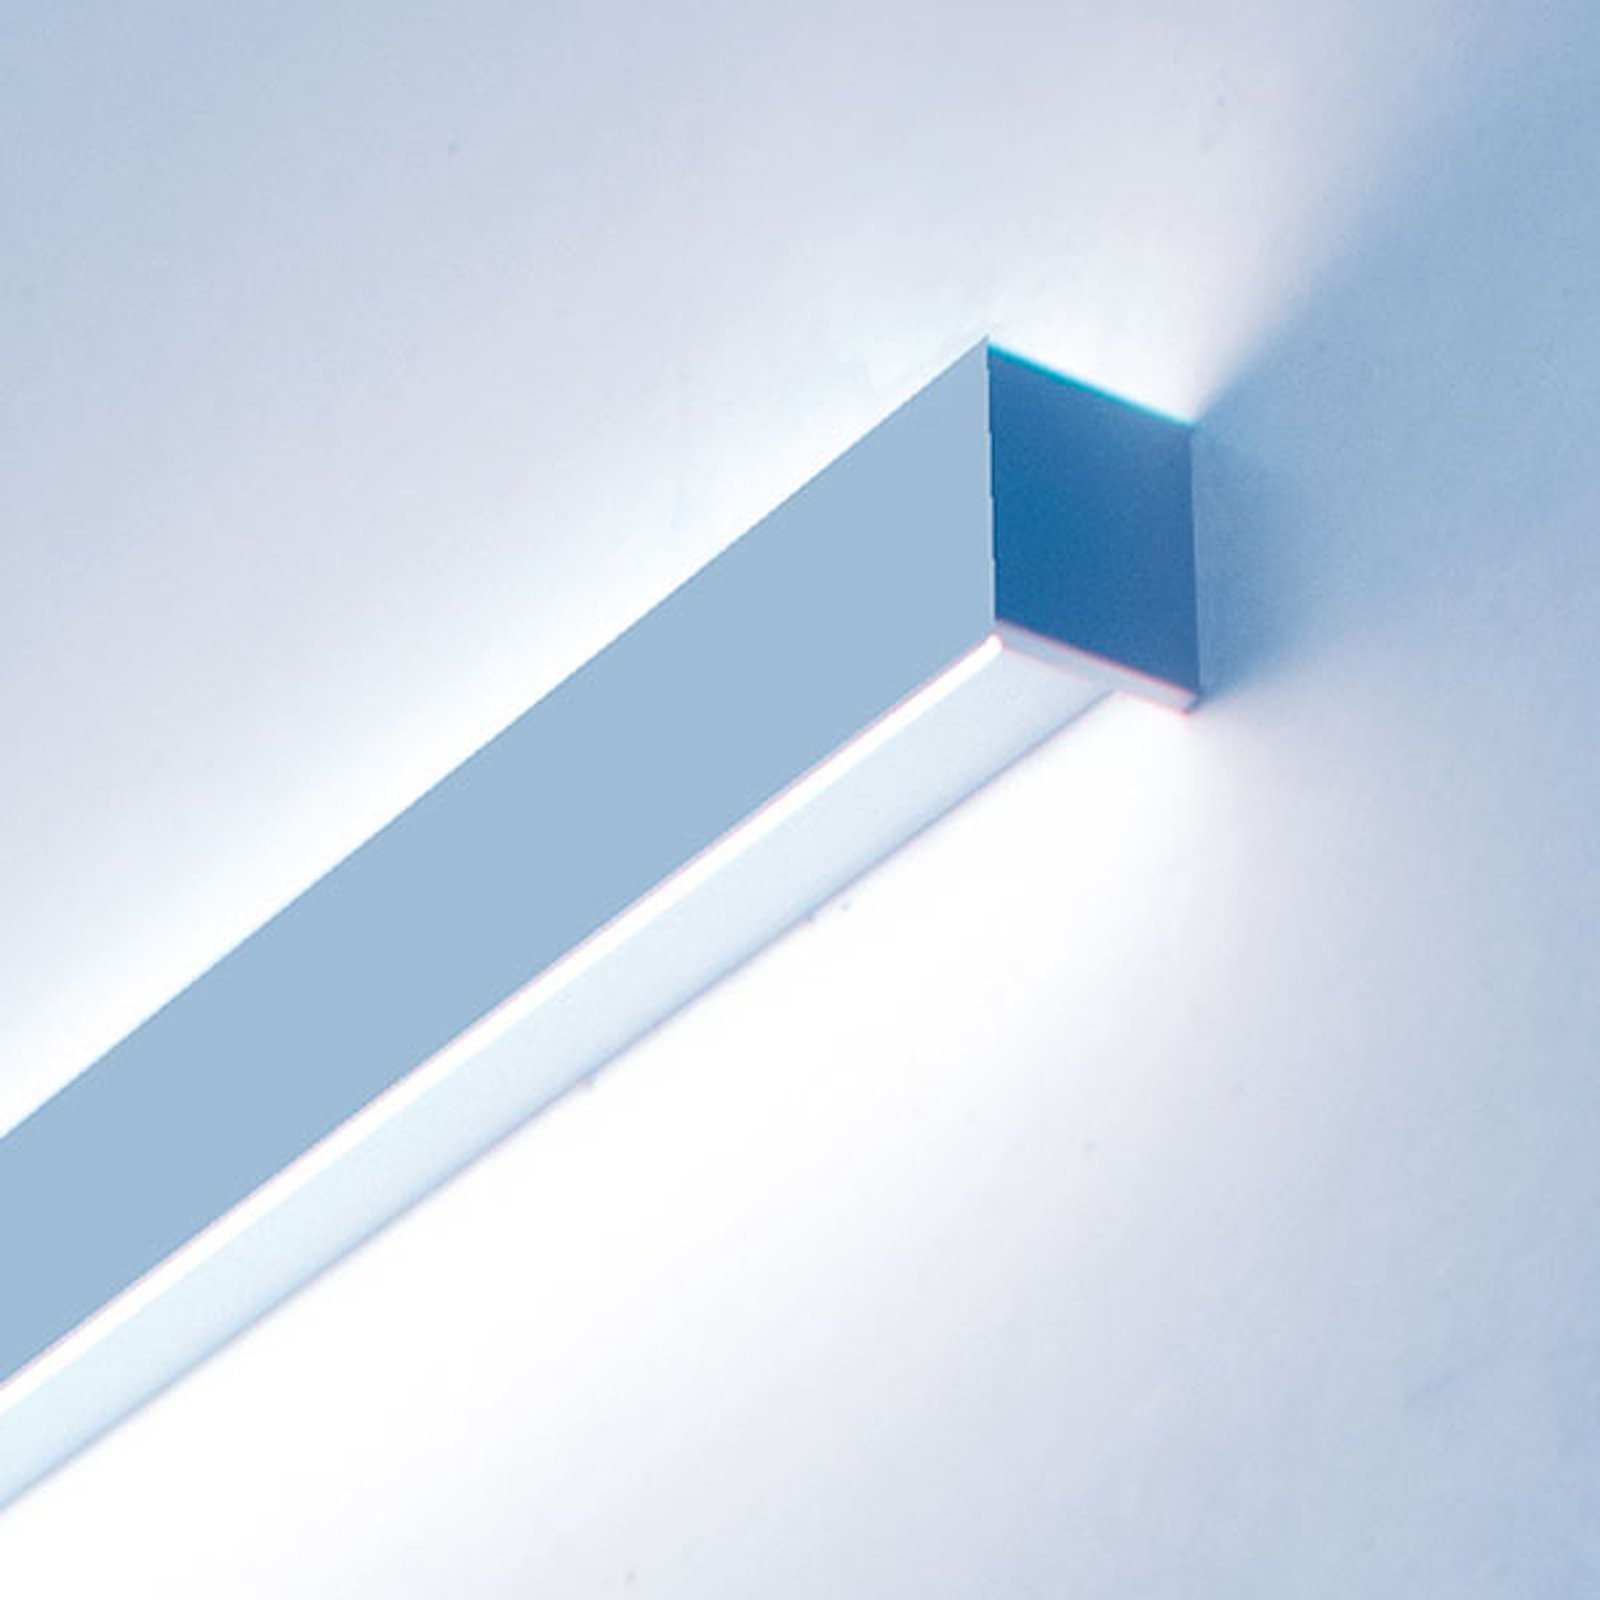 Matric W1 LED-vegglampe i 147,8 cm, 3 000 K